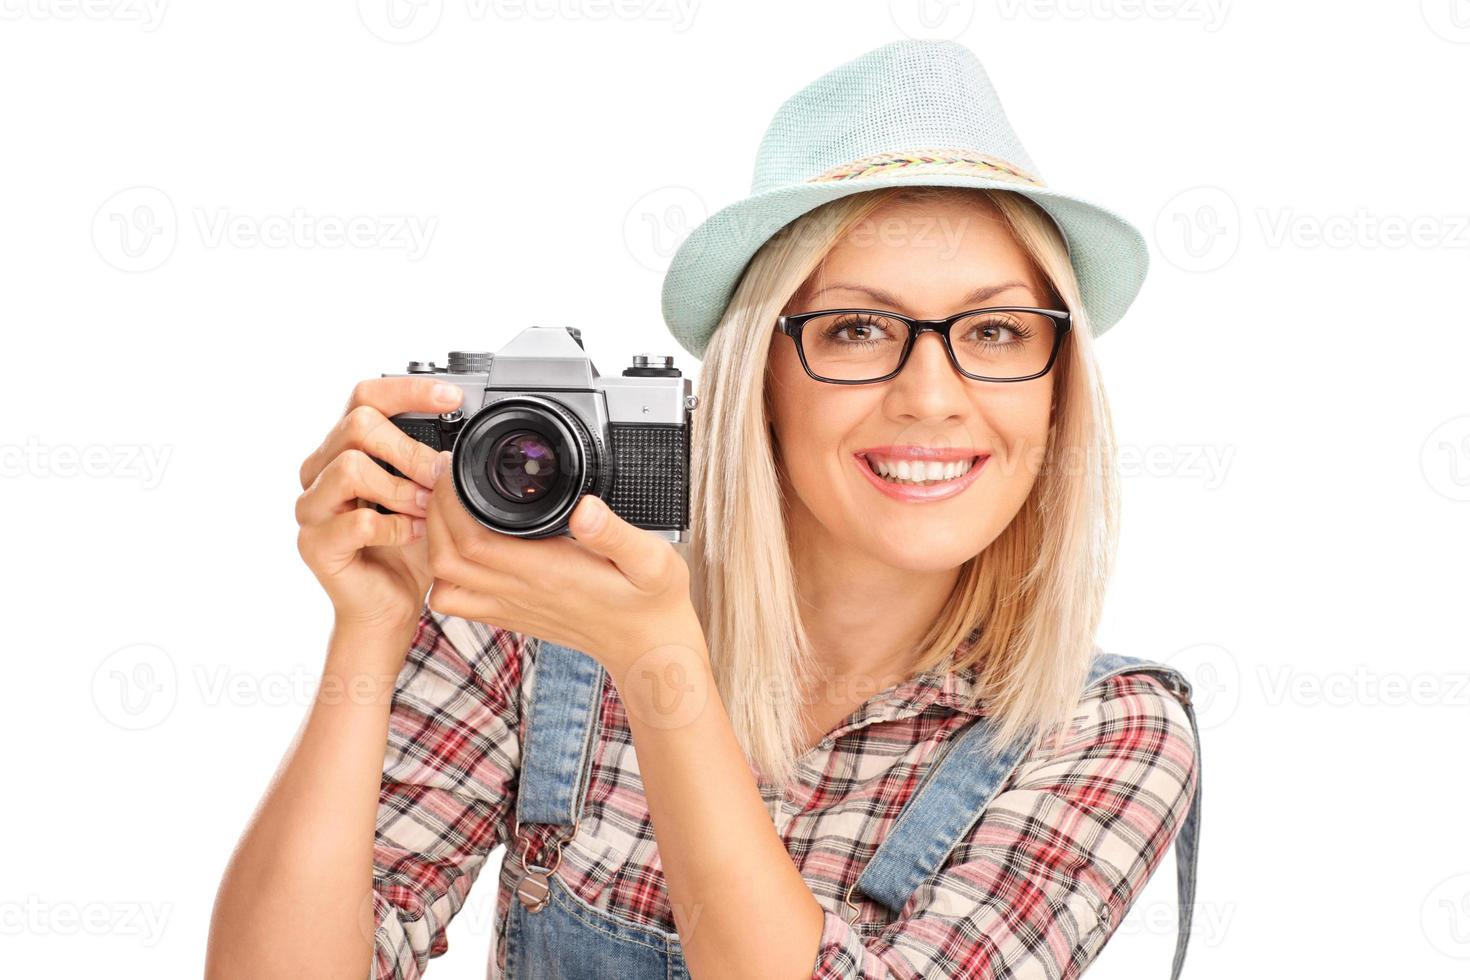 mujer fotógrafa sosteniendo una cámara foto